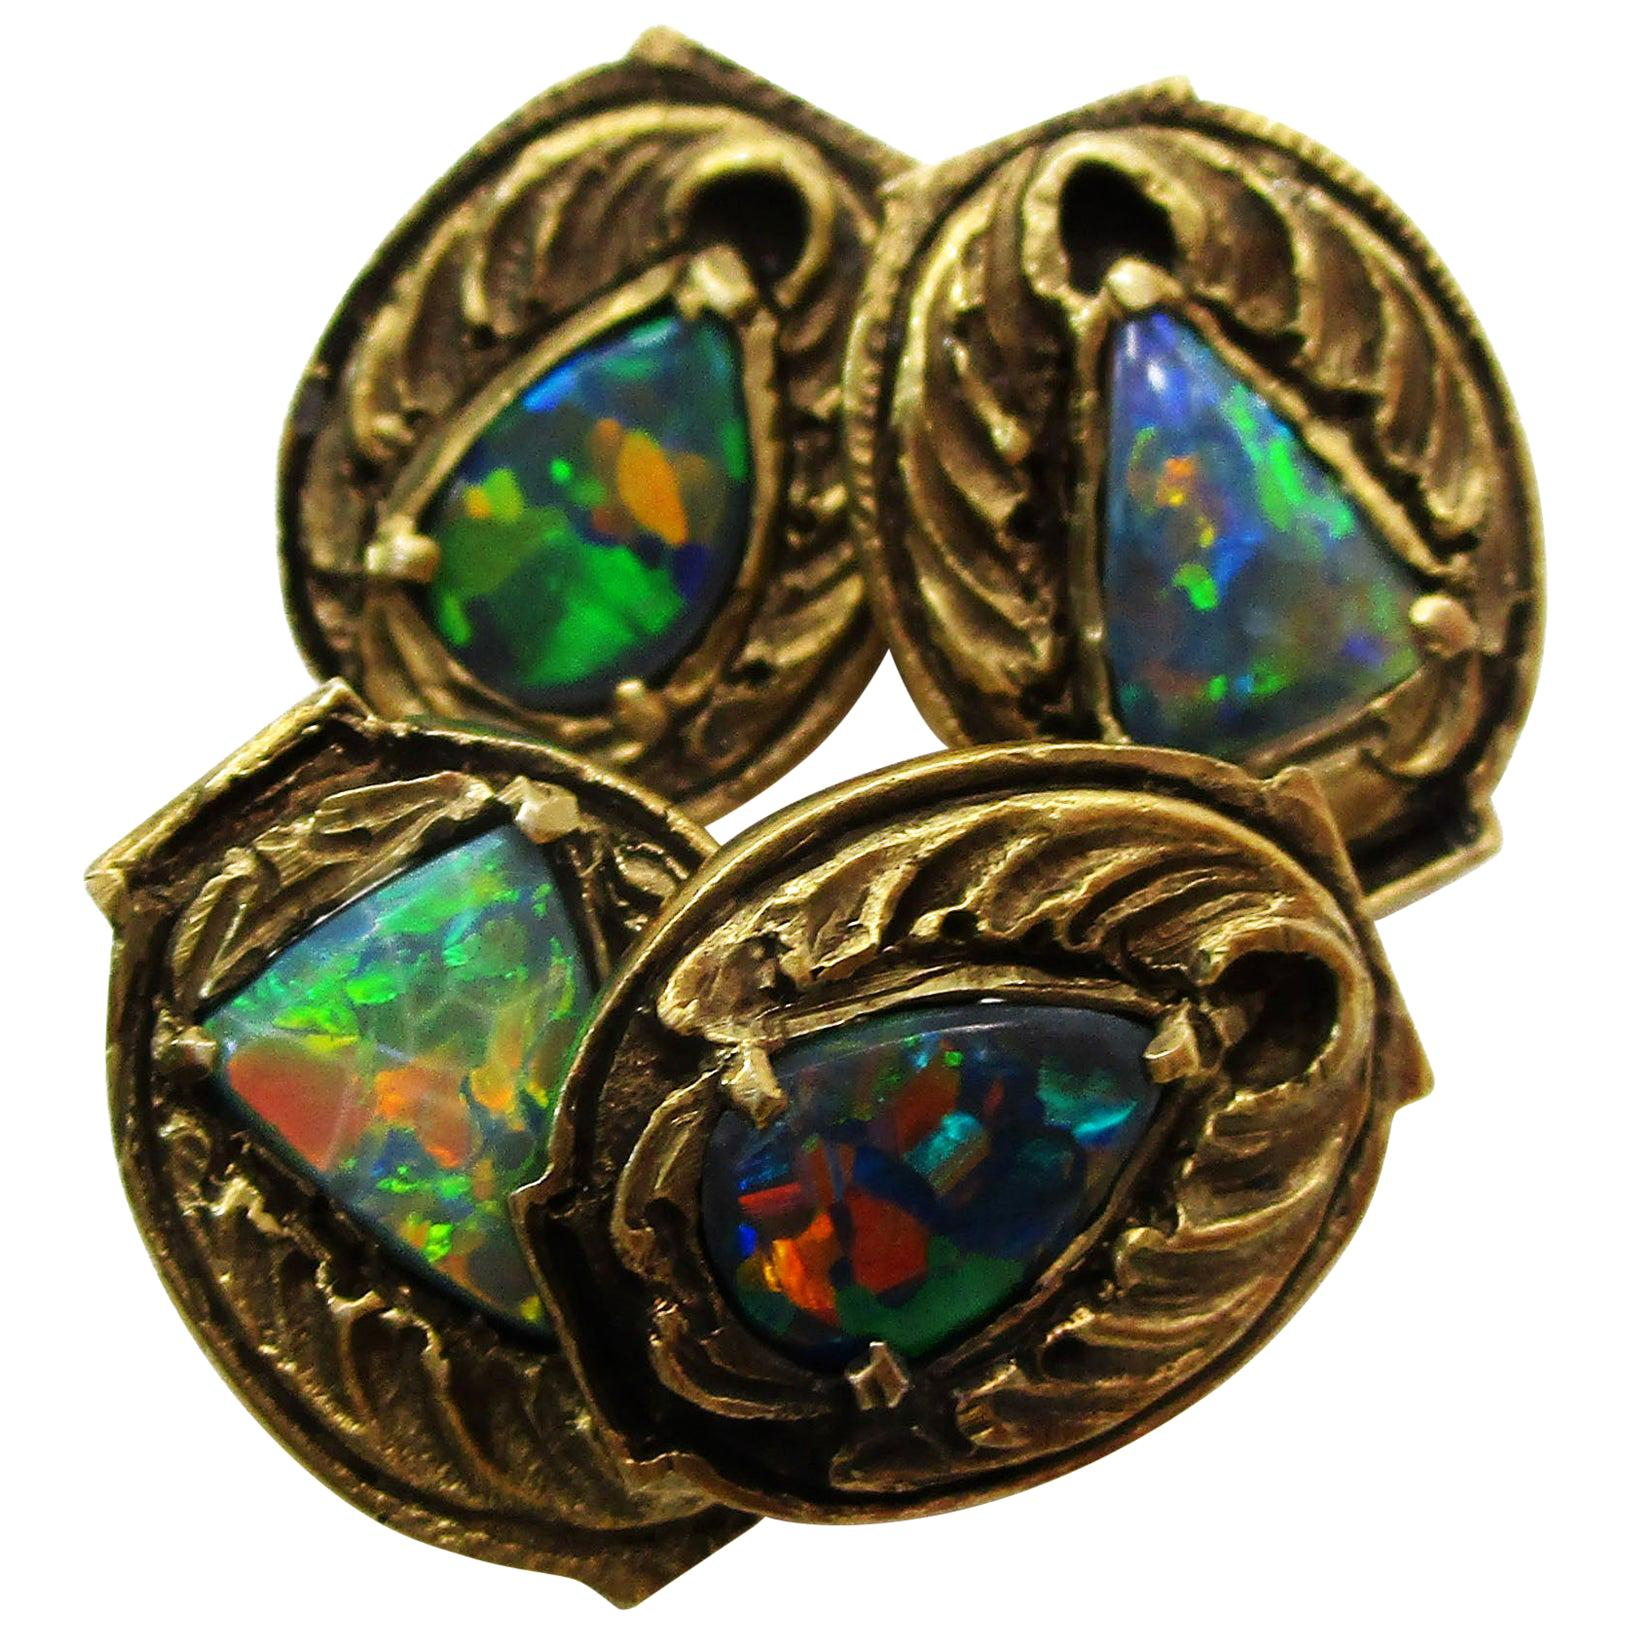 Walton & Co Arts & Craft 14 Karat Yellow Gold Black Opal Cufflinks